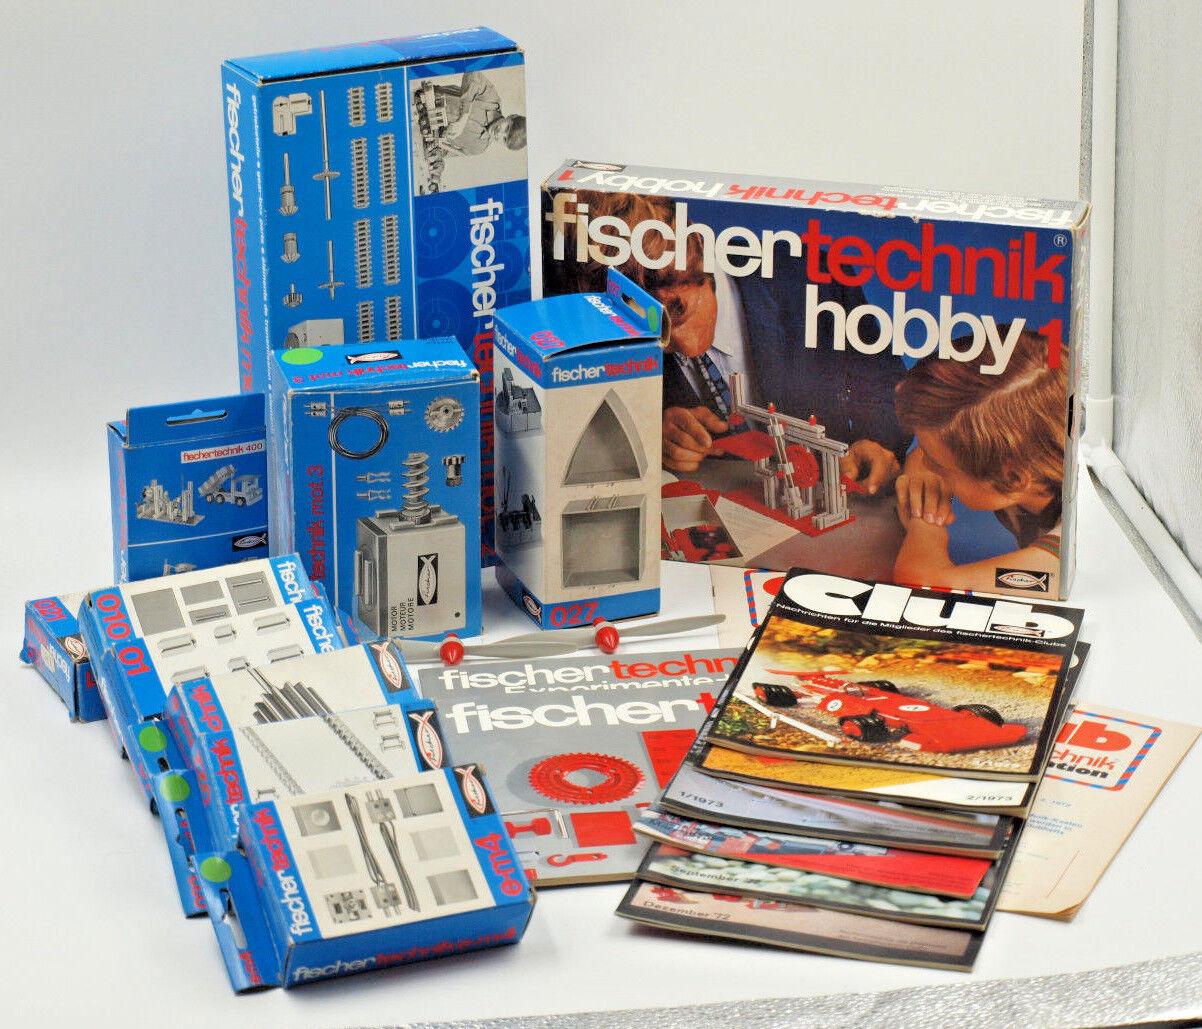 Fischer Technik ® bundle of 1972-1973 Club News Hobby Accessory Parts